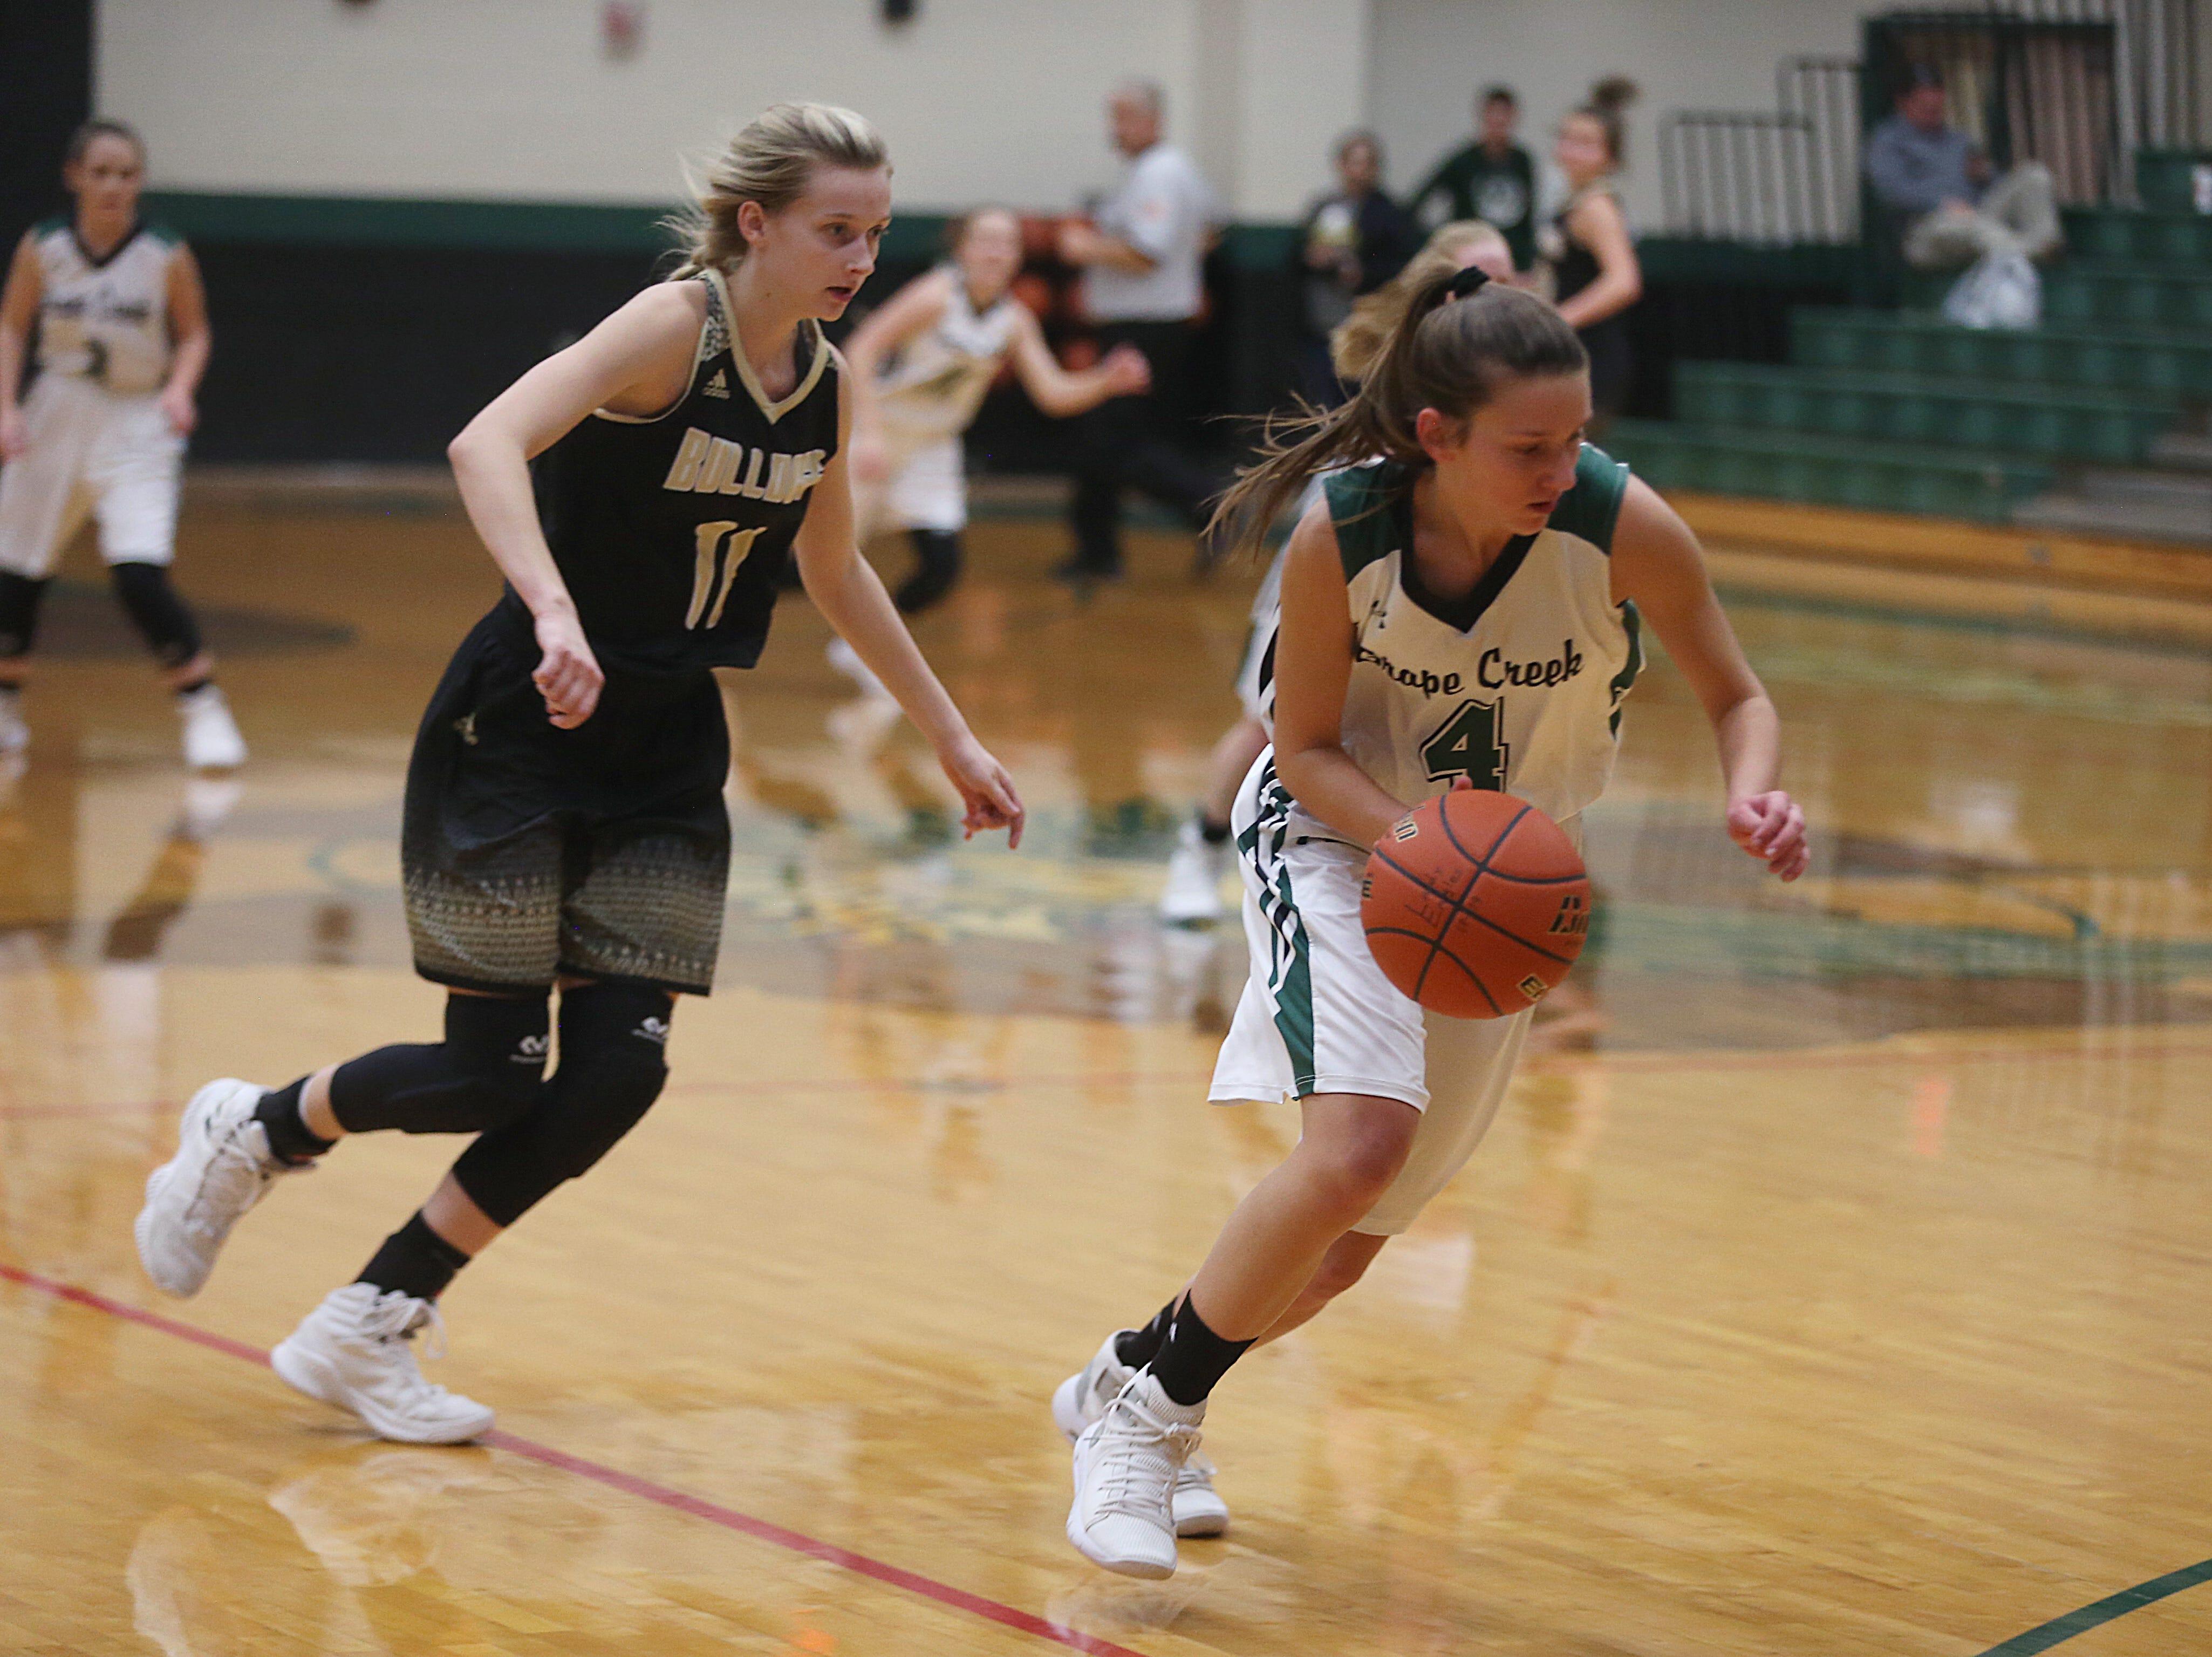 Grape Creek's Rachel Porter (#4) dribbles past Brady's K. Robbin (#11) Friday, Dec. 14, 2018 during their game in Grape Creek. Brady won 48 to 28.